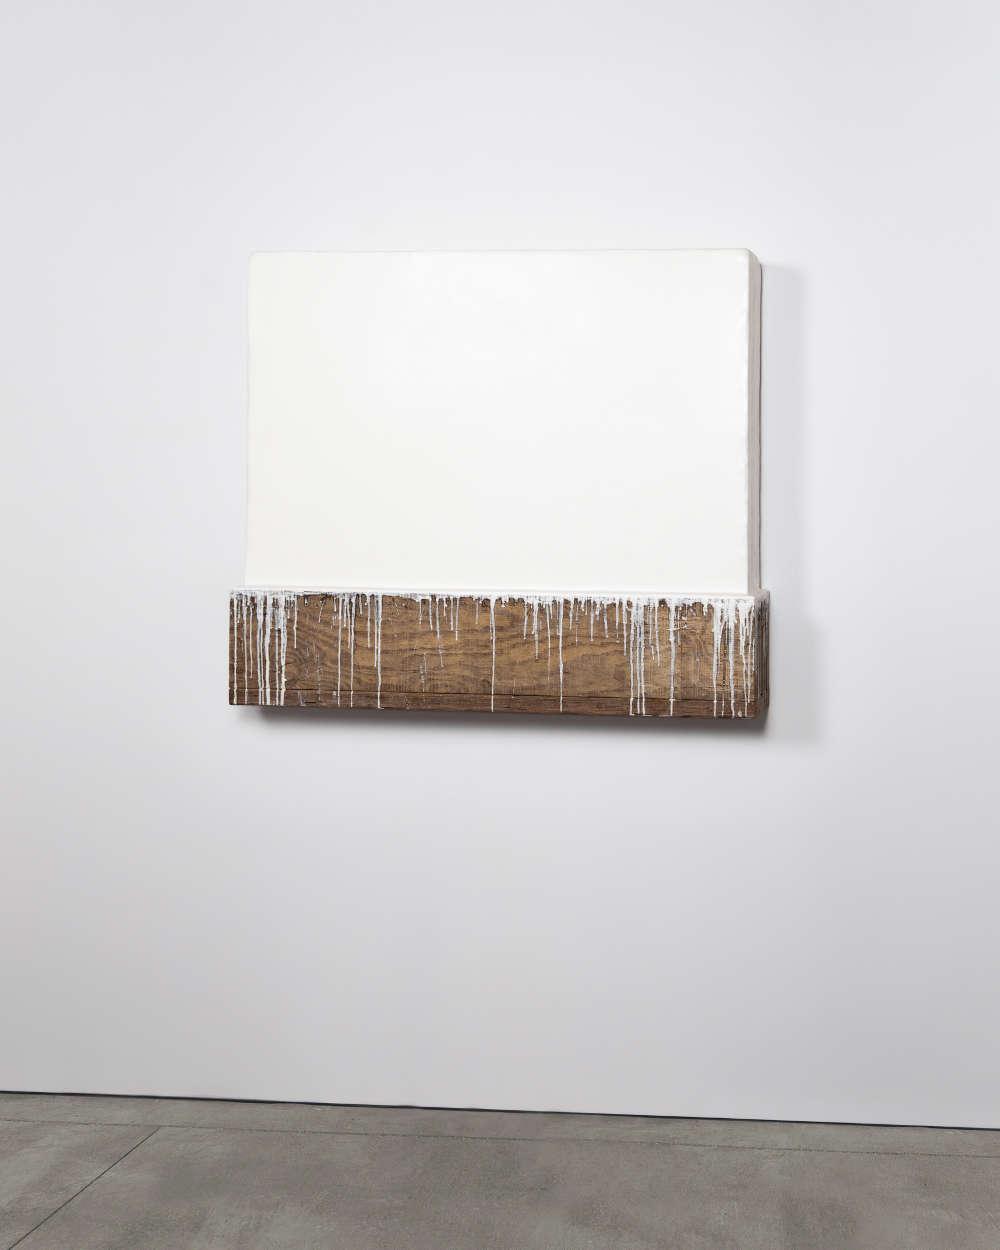 Johannes Girardoni, Dripbox—Titanium White, 2018. Beeswax, pigment and wood 42 x 48 x 9 inches (107 x 122 x 23 cm) © Johannes Girardoni Studio